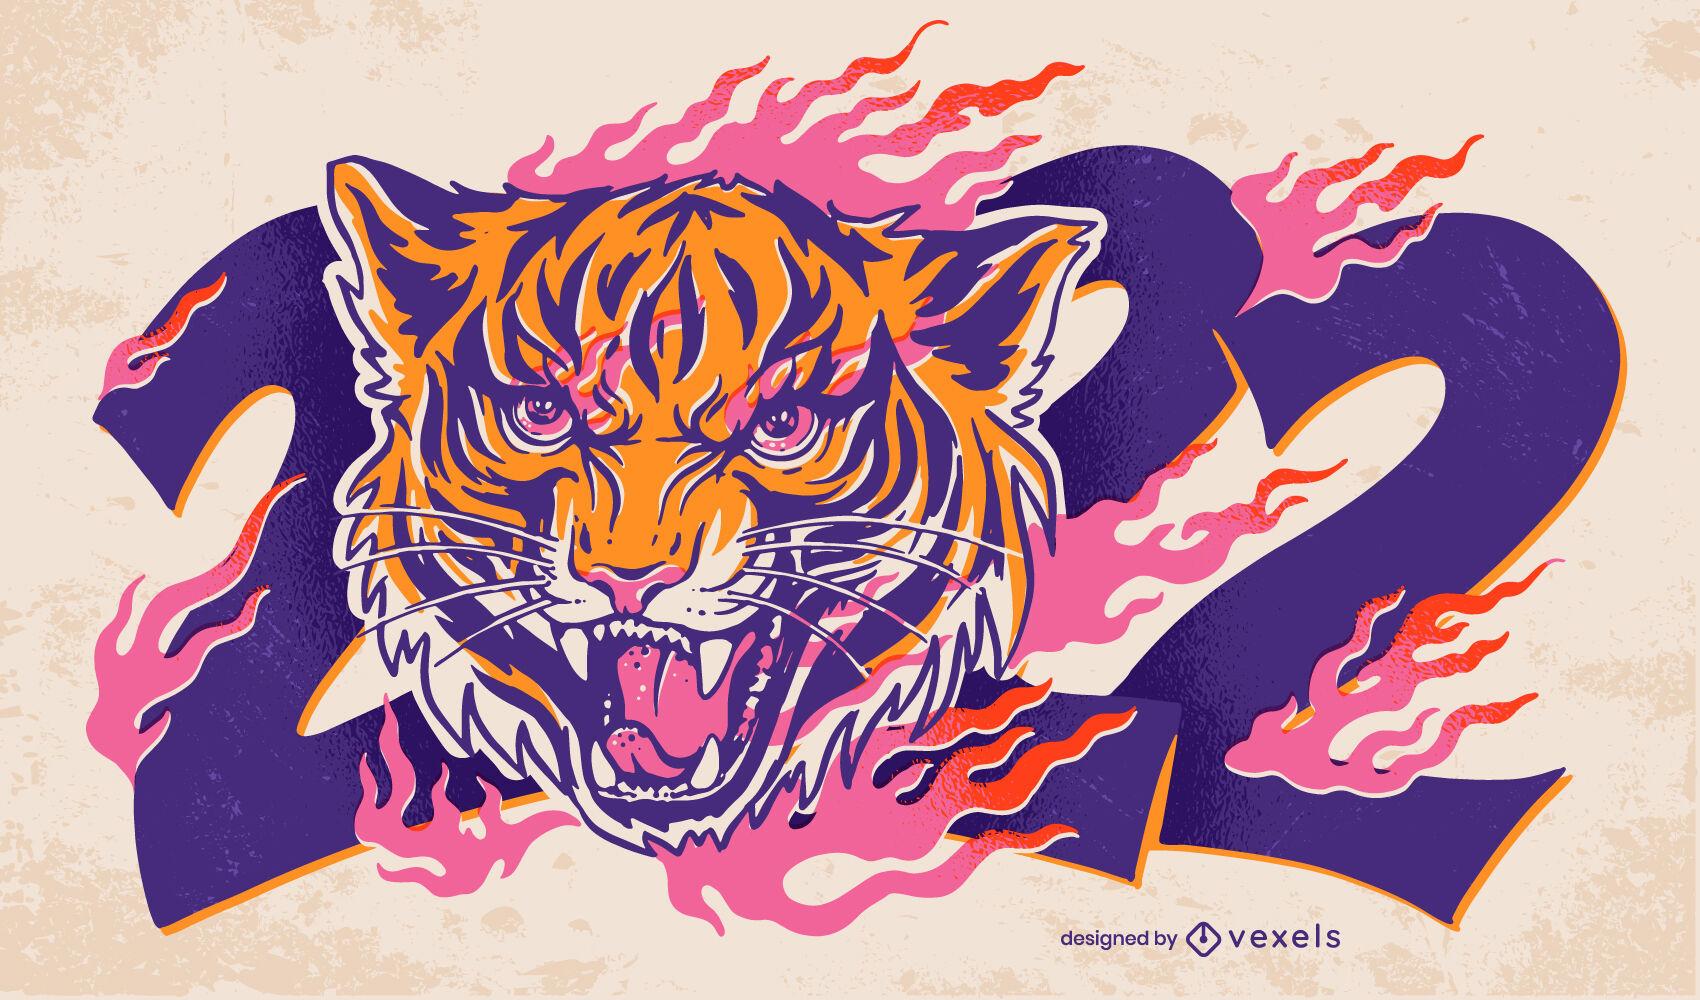 Chinese new year 2022 illustration design